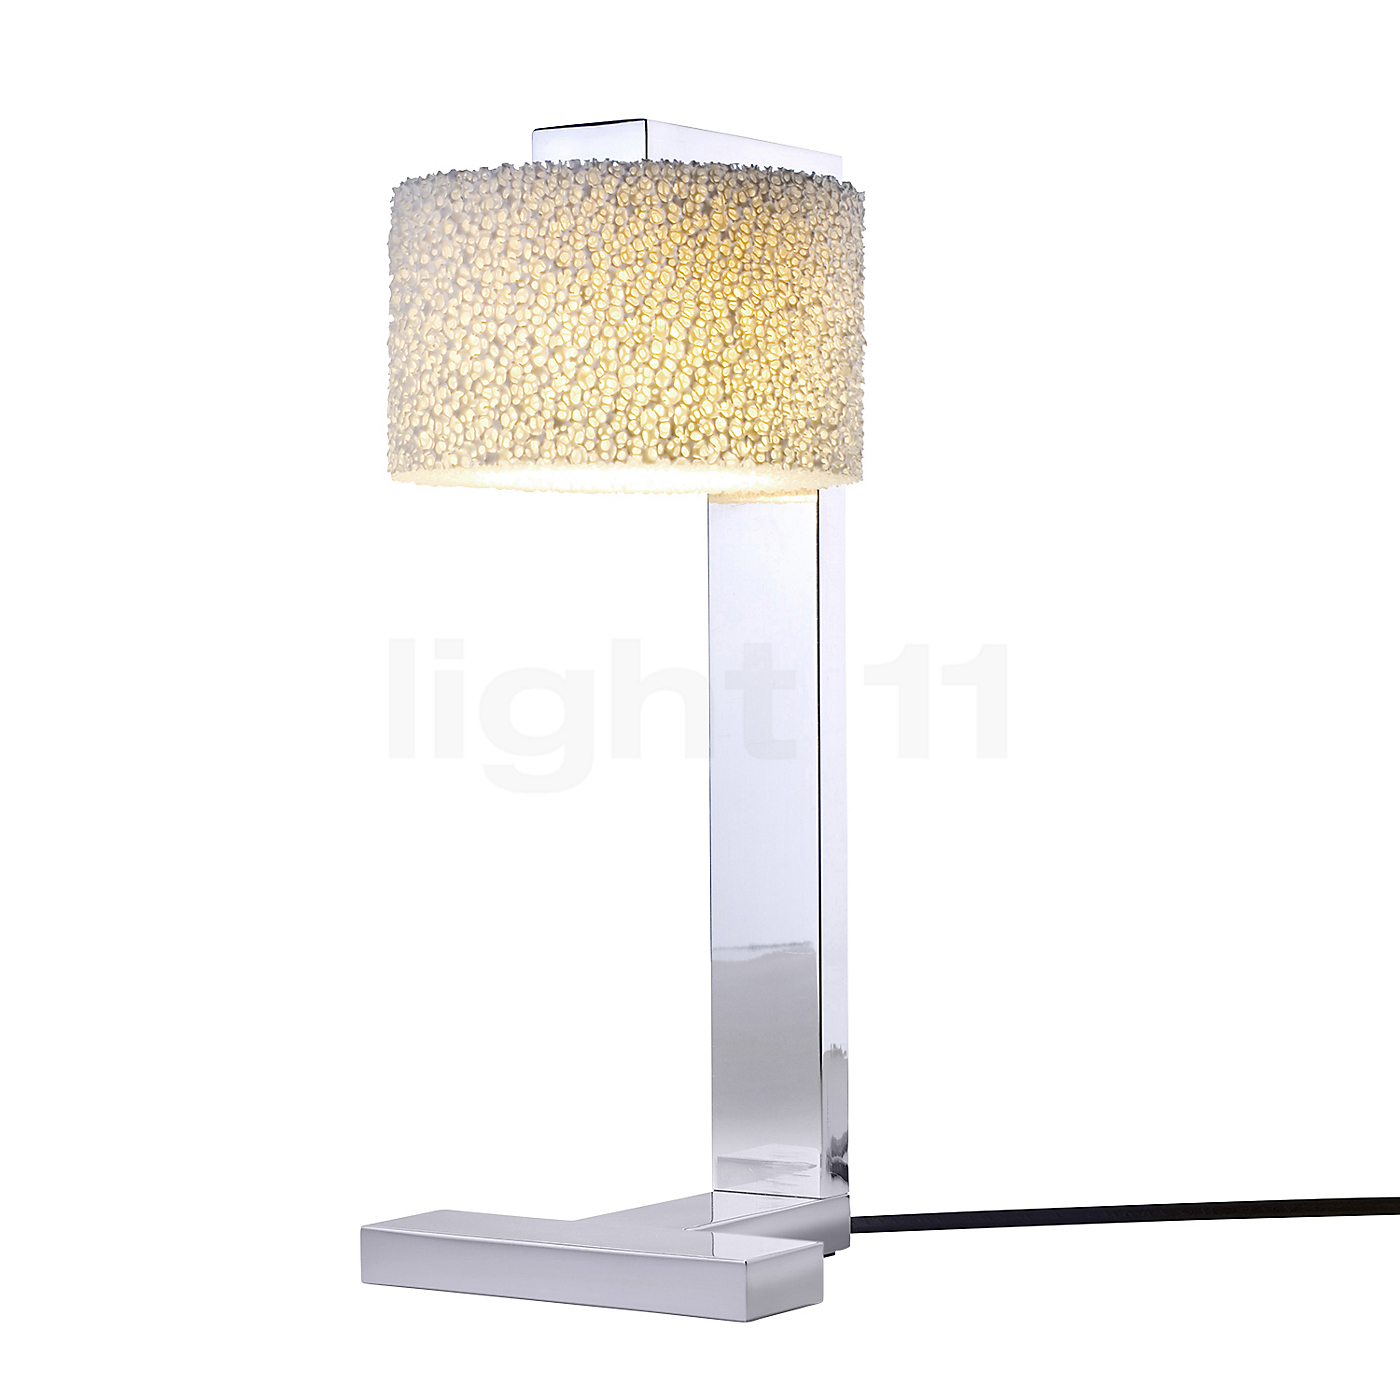 serien lighting reef table led table lamps buy at. Black Bedroom Furniture Sets. Home Design Ideas